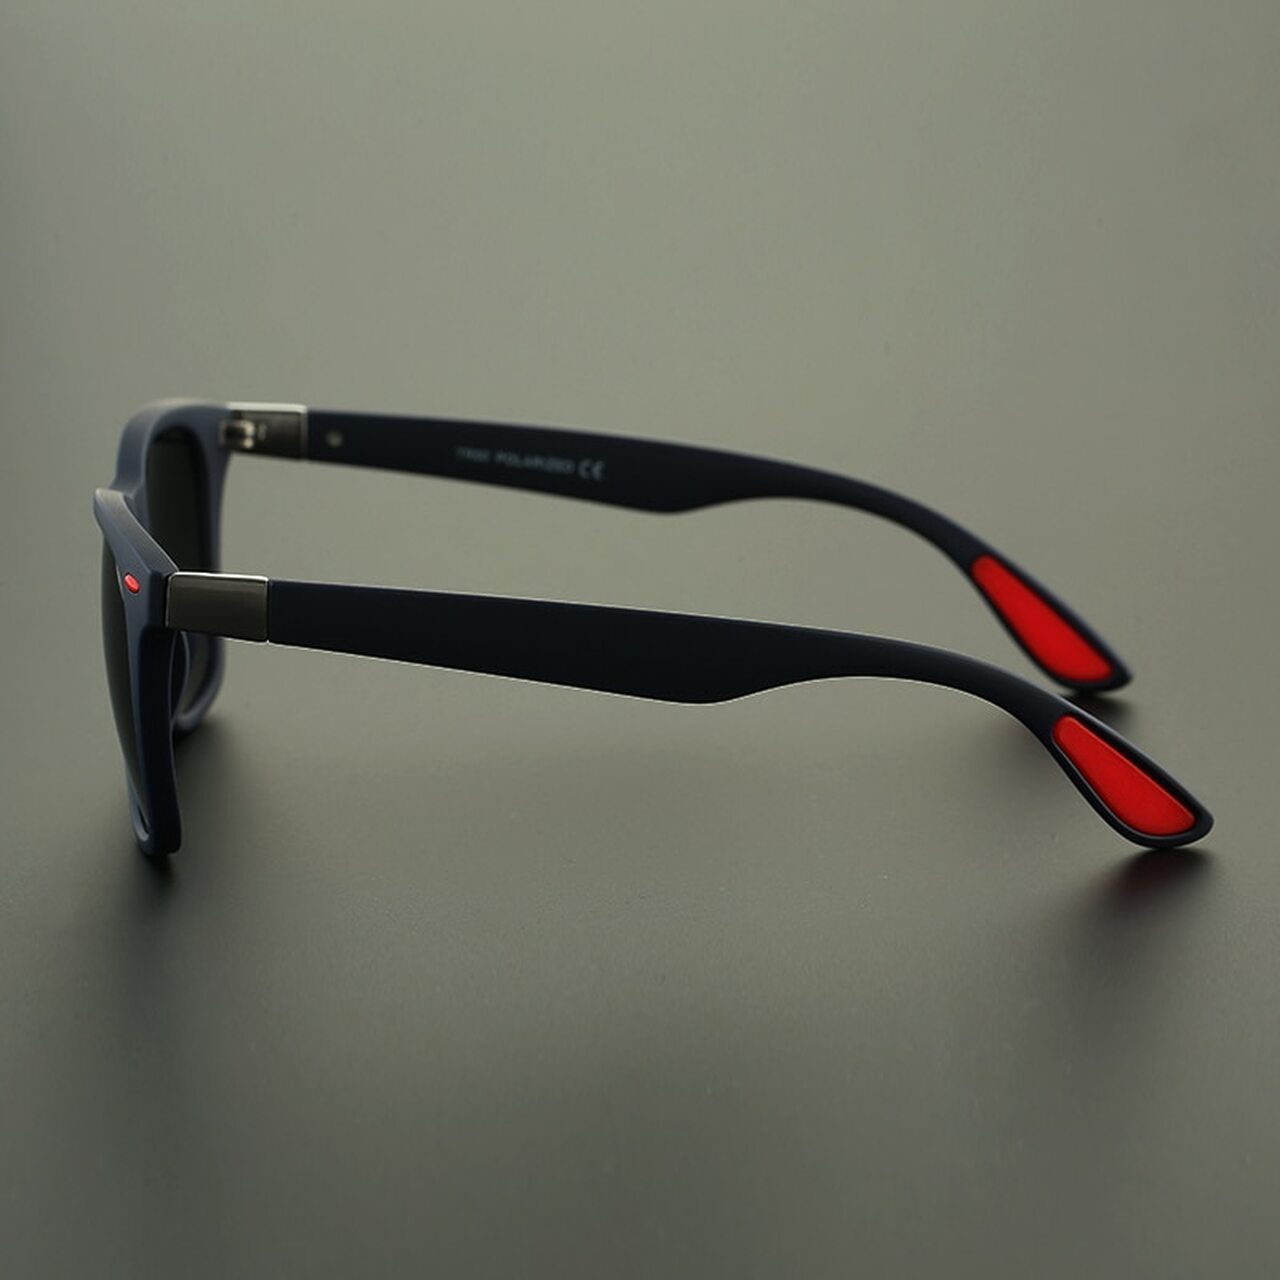 fd458fb4b87 ... BRAND DESIGN Classic Polarized Sunglasses Men Women Driving Square  Frame Sun Glasses Male Goggle UV400 Gafas ...